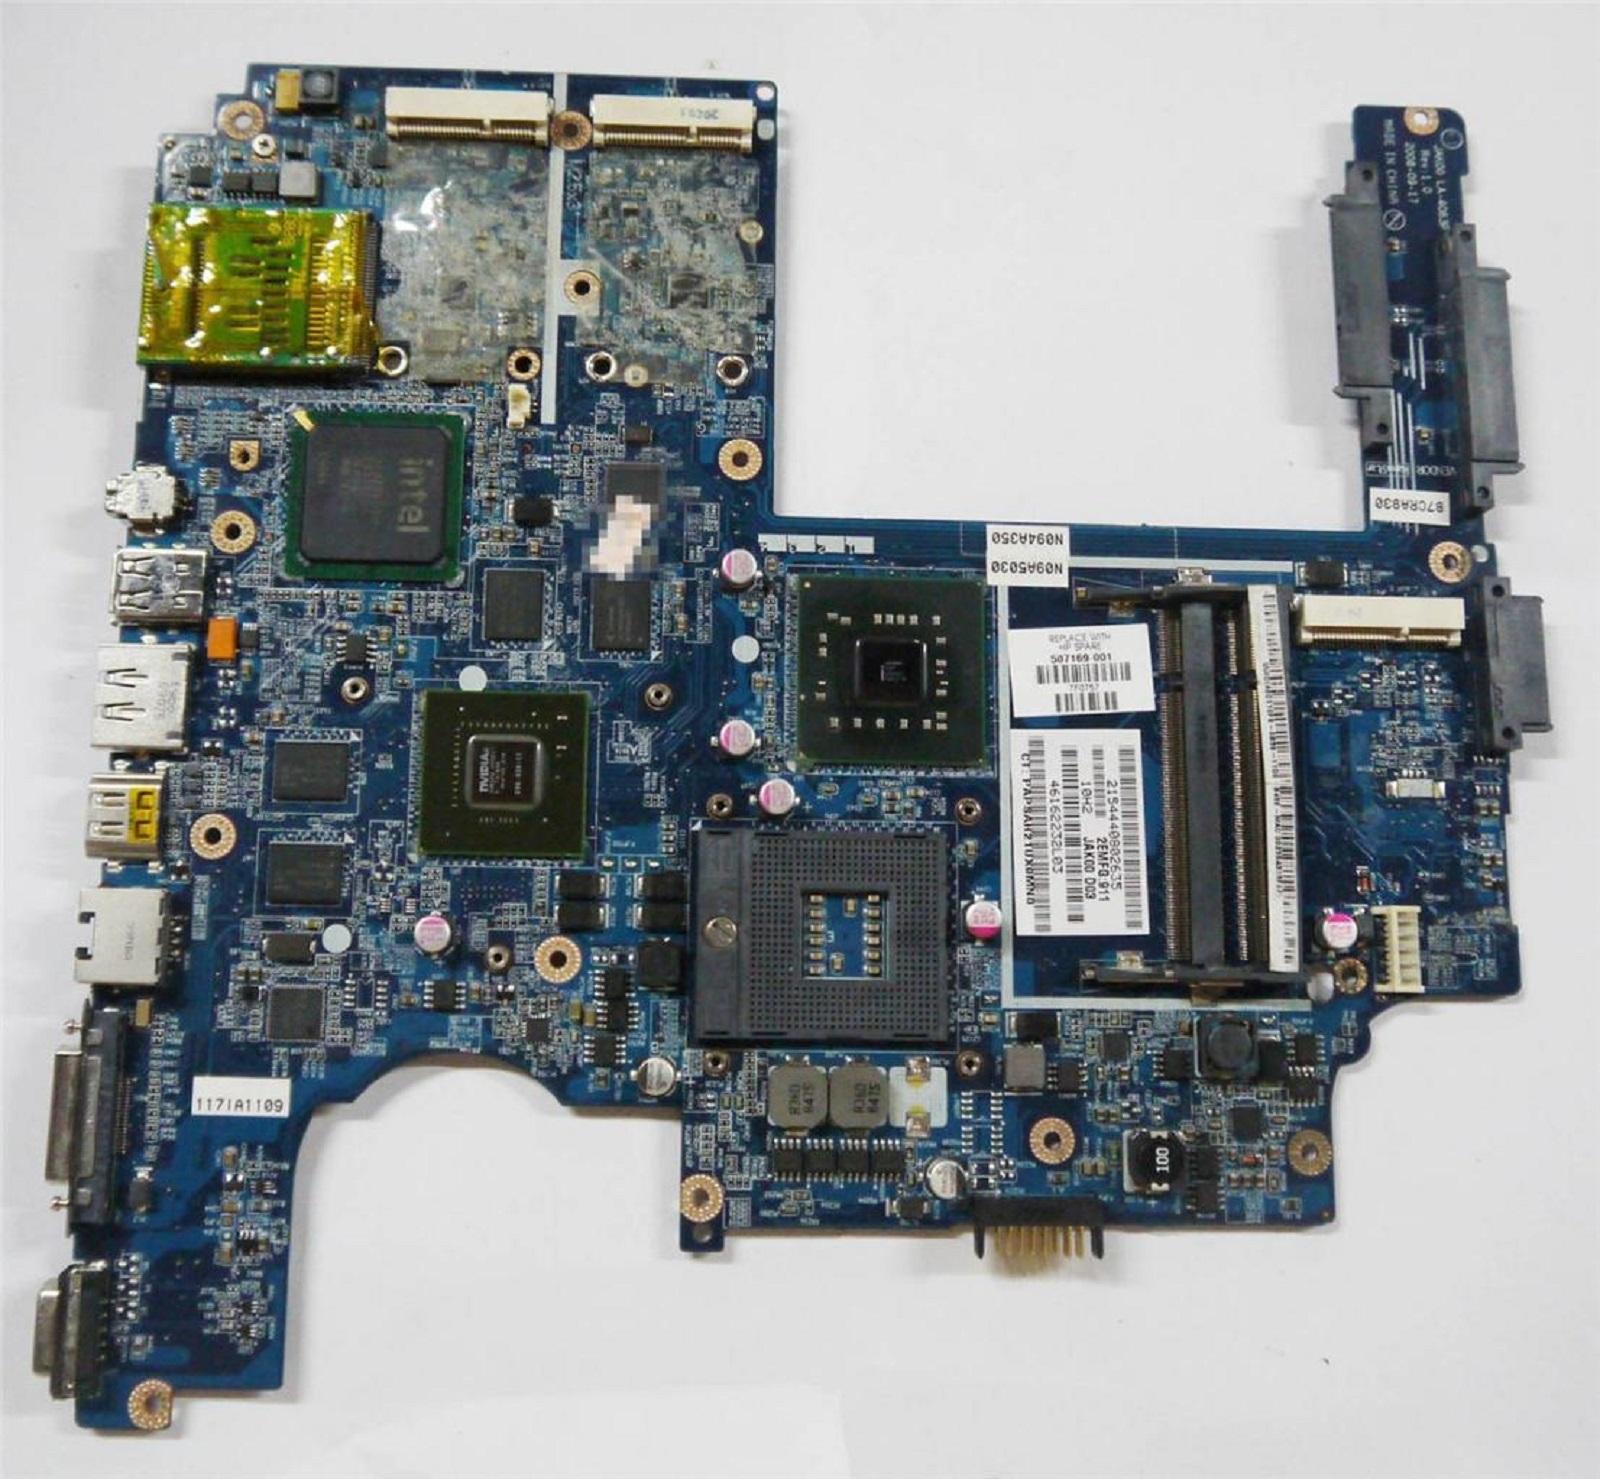 The Memory Kit comes with Life Time Warranty. 4GB Team High Performance Memory RAM Upgrade Single Stick For HP Compaq Pavilion dv7-1105em dv7-1105tx dv7-1106ef dv7-1106eg Laptop